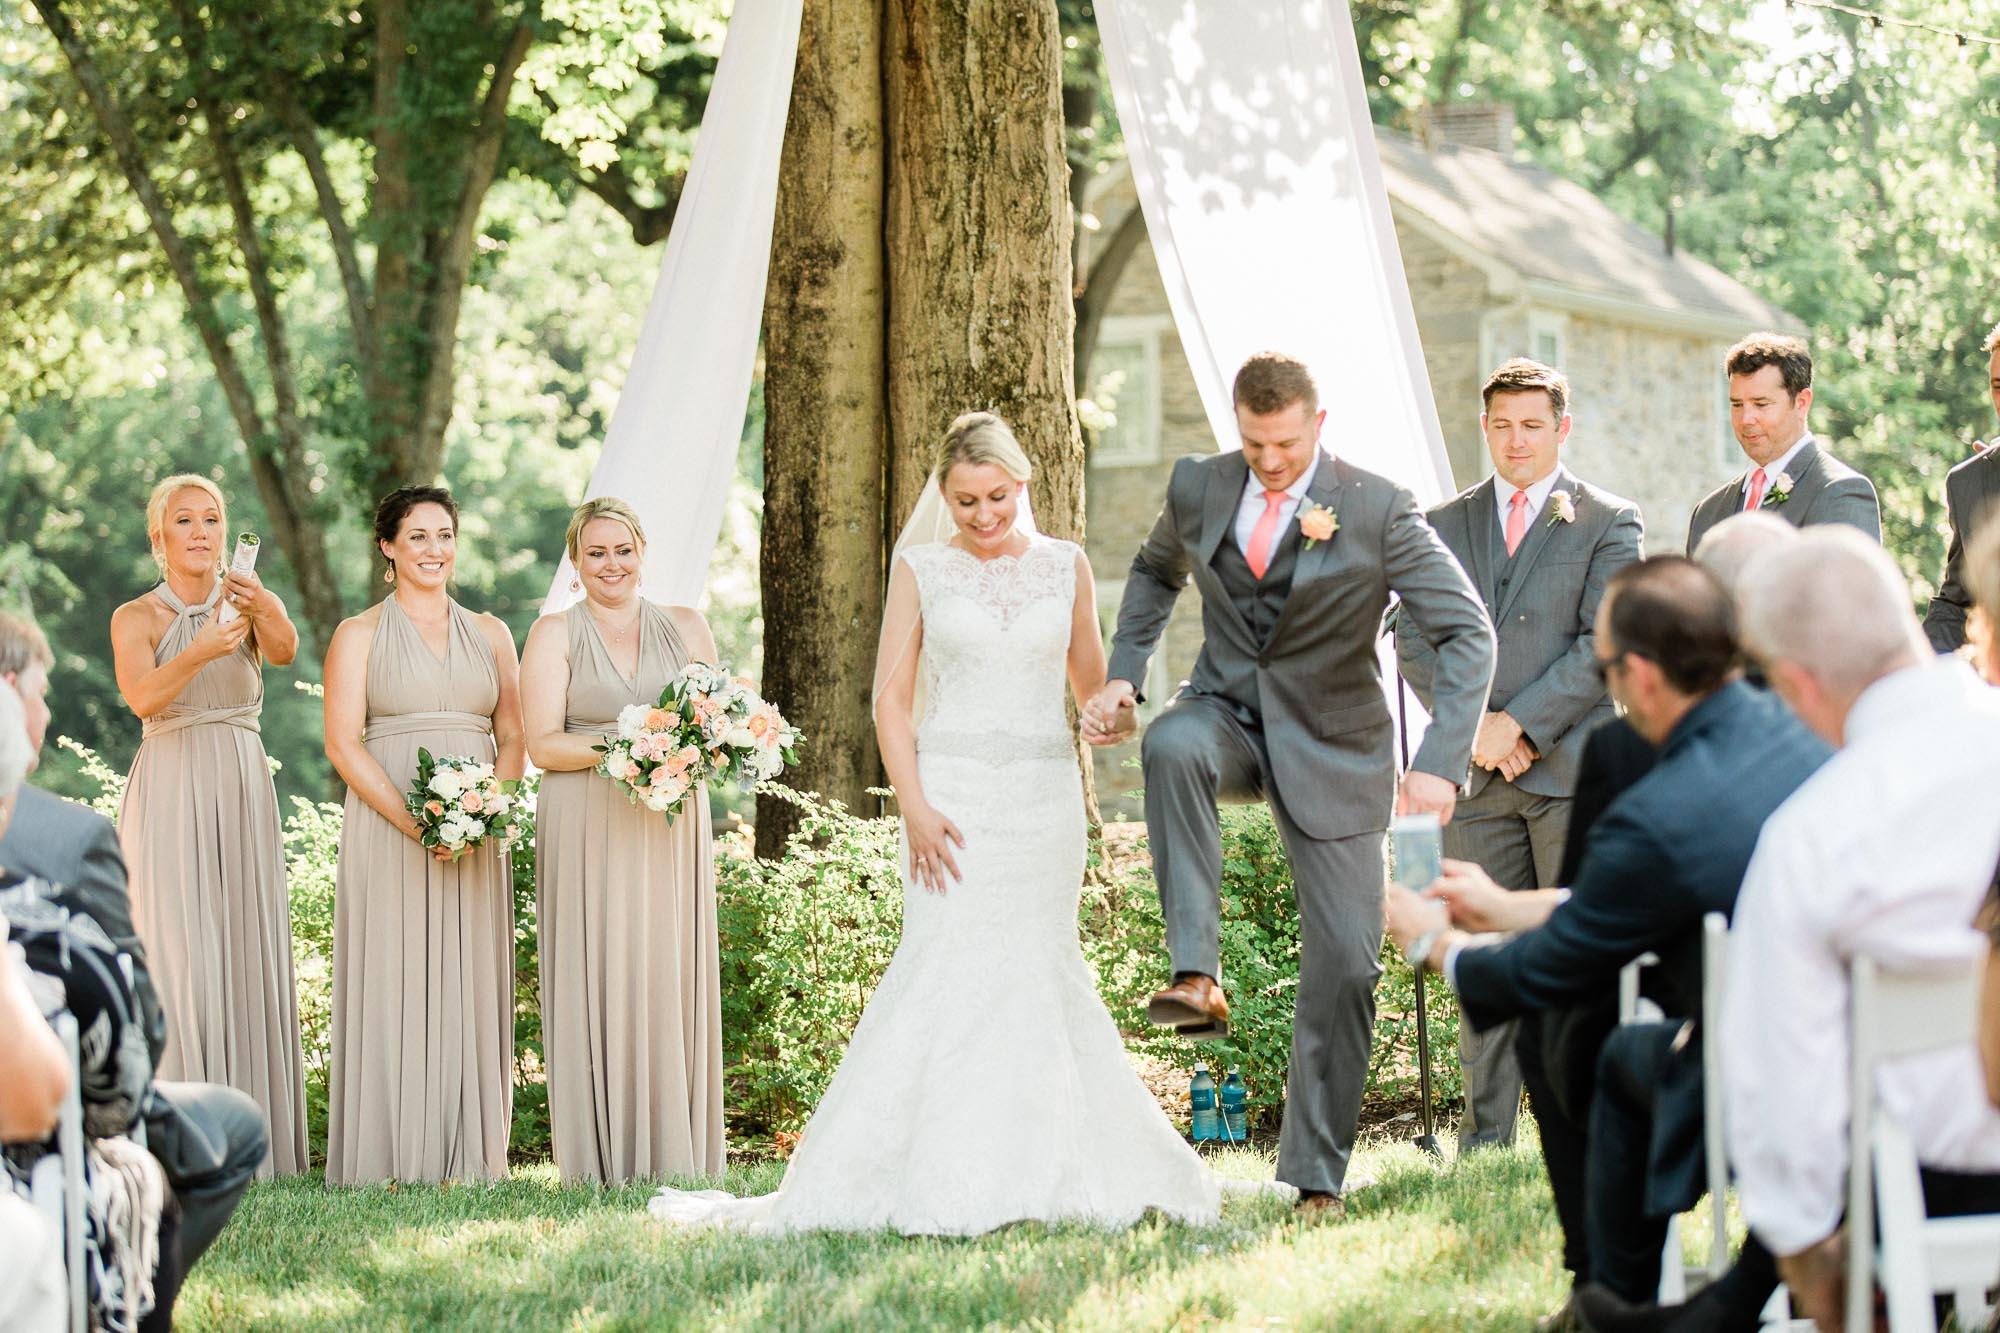 Allenberry-resort-historic-pennsylvania-wedding-22132.jpg